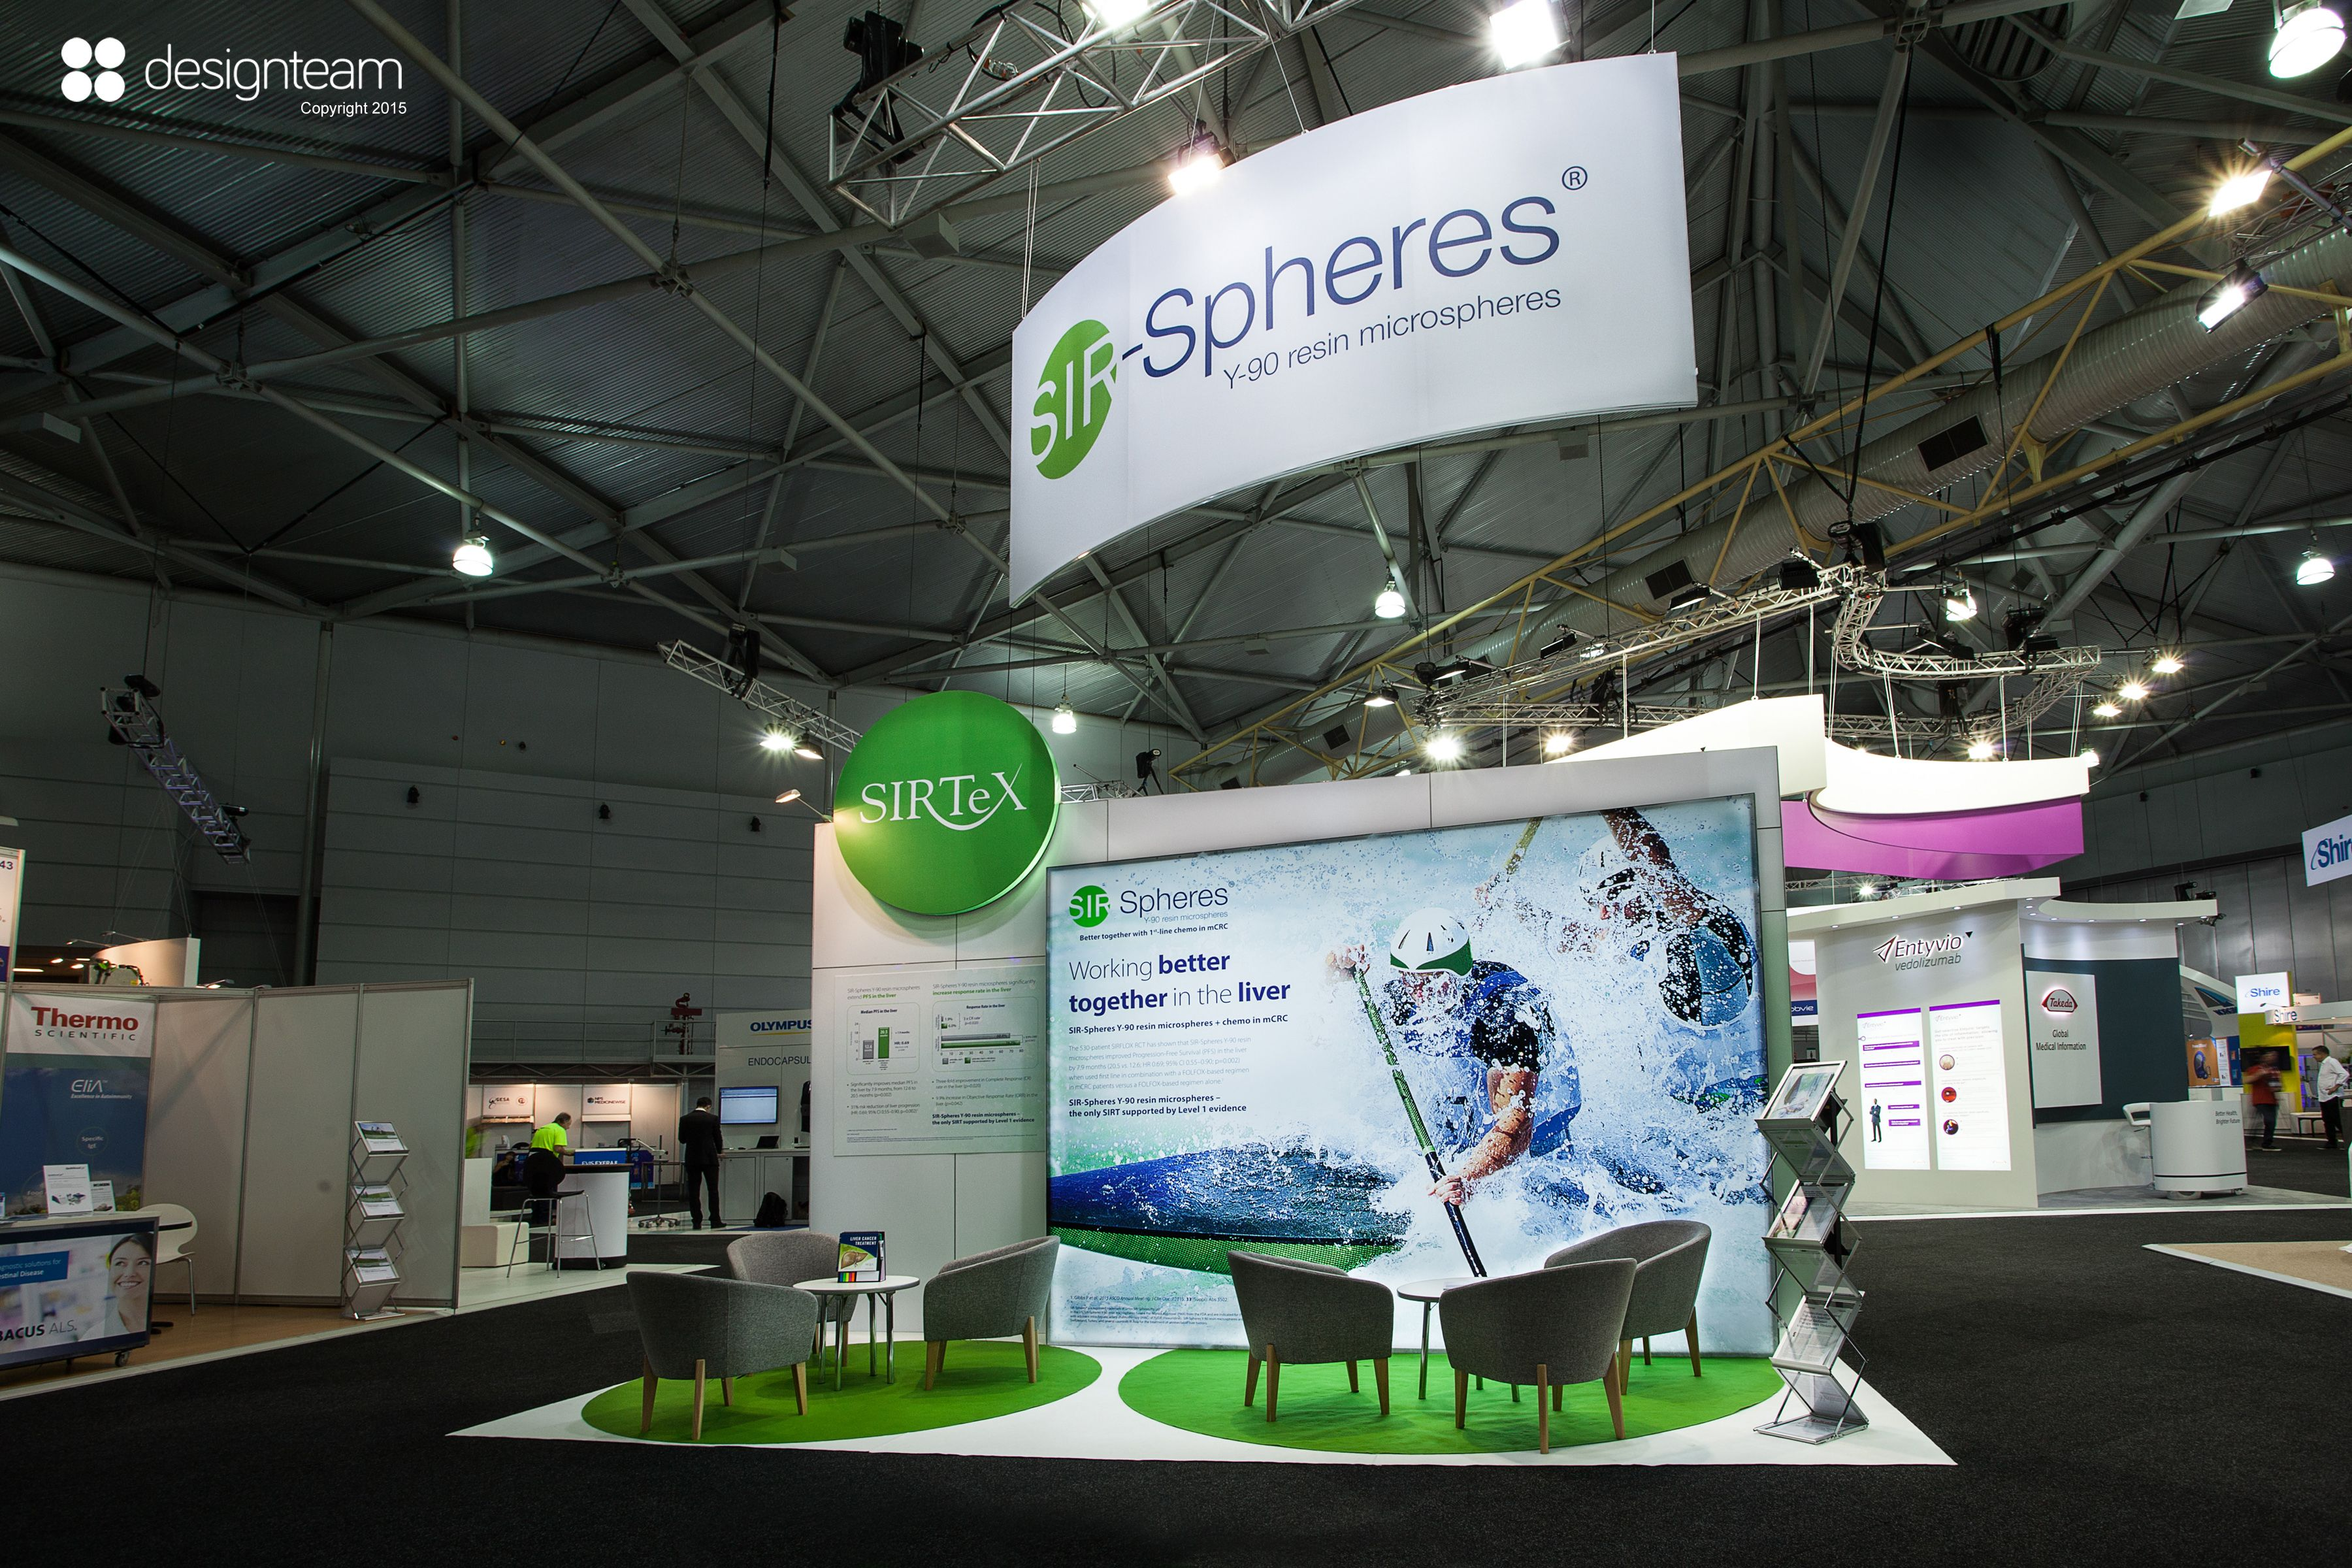 Sirtex agw sirtex is a global lifesciences company that